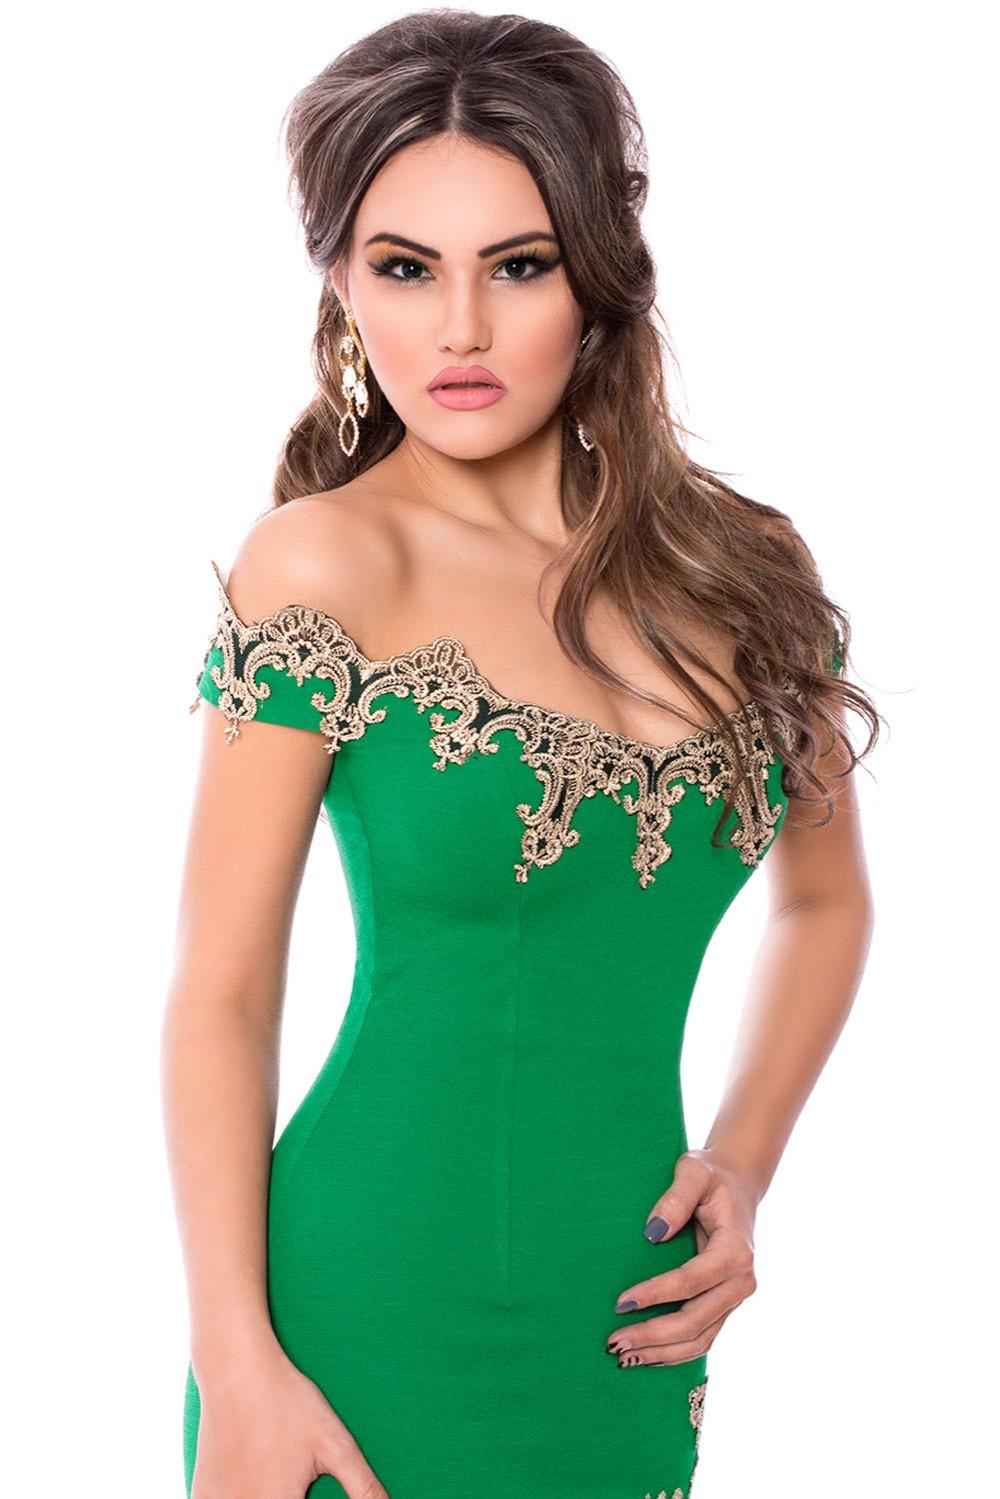 Gold-Lace-Applique-Green-Off-Shoulder-Mini-Dress-LC22715-9-2